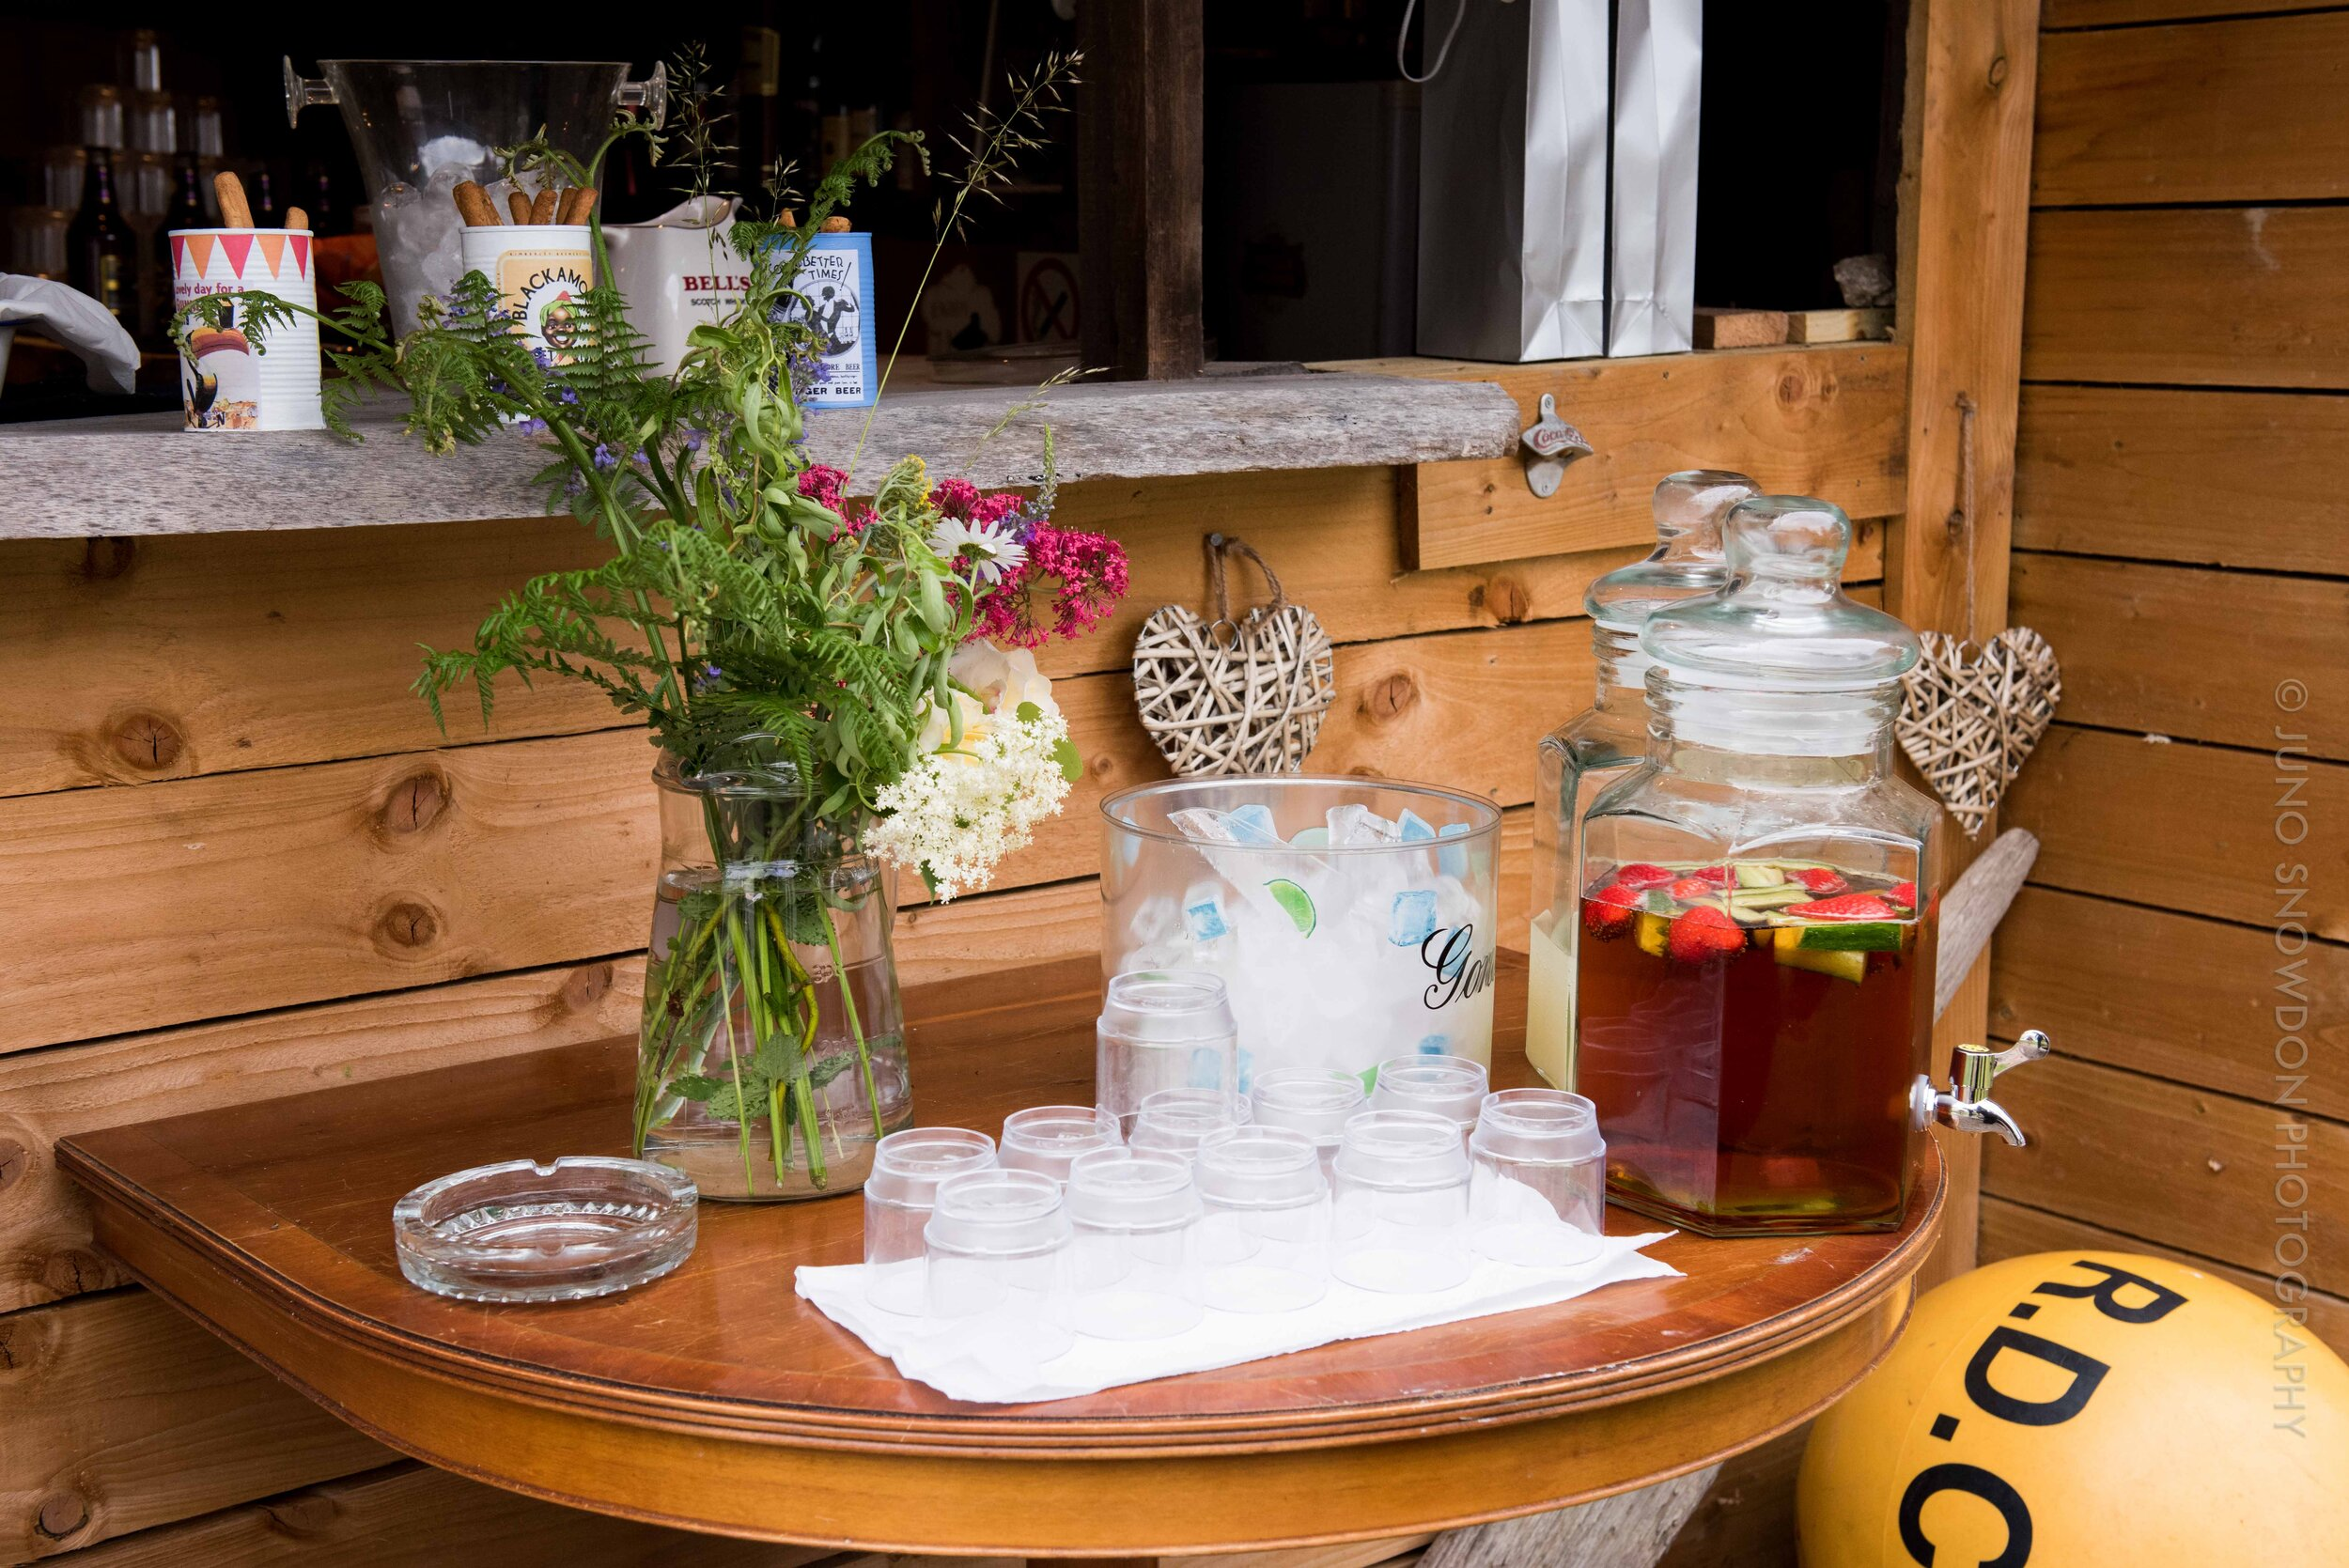 juno-snowdon-photography-wedding-7940.jpg